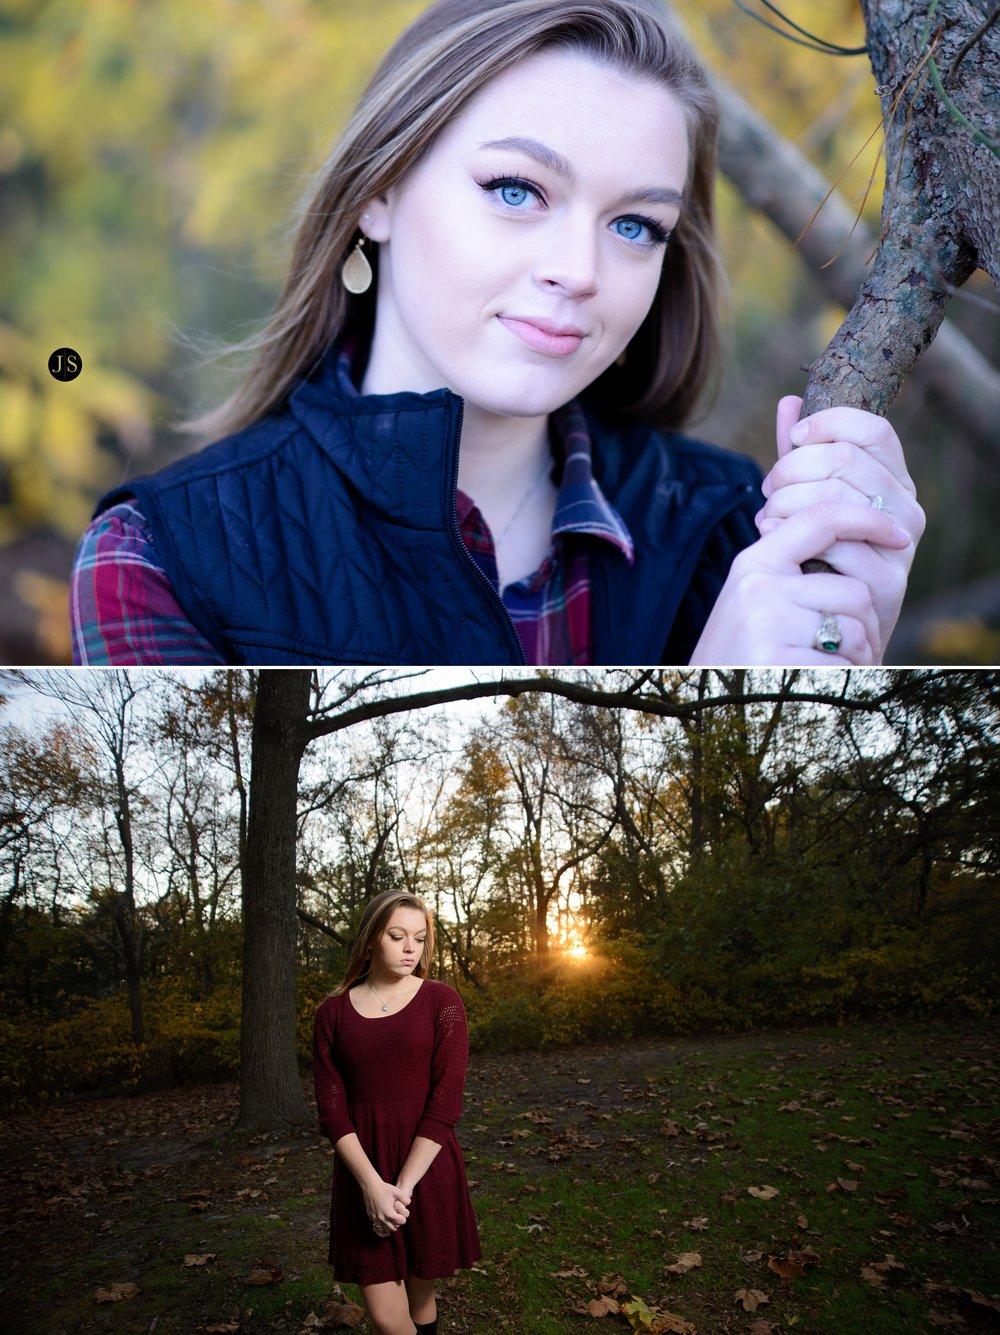 senior-portrait-polevault-pemberton-park-maryland-portraits-photo 16.jpg